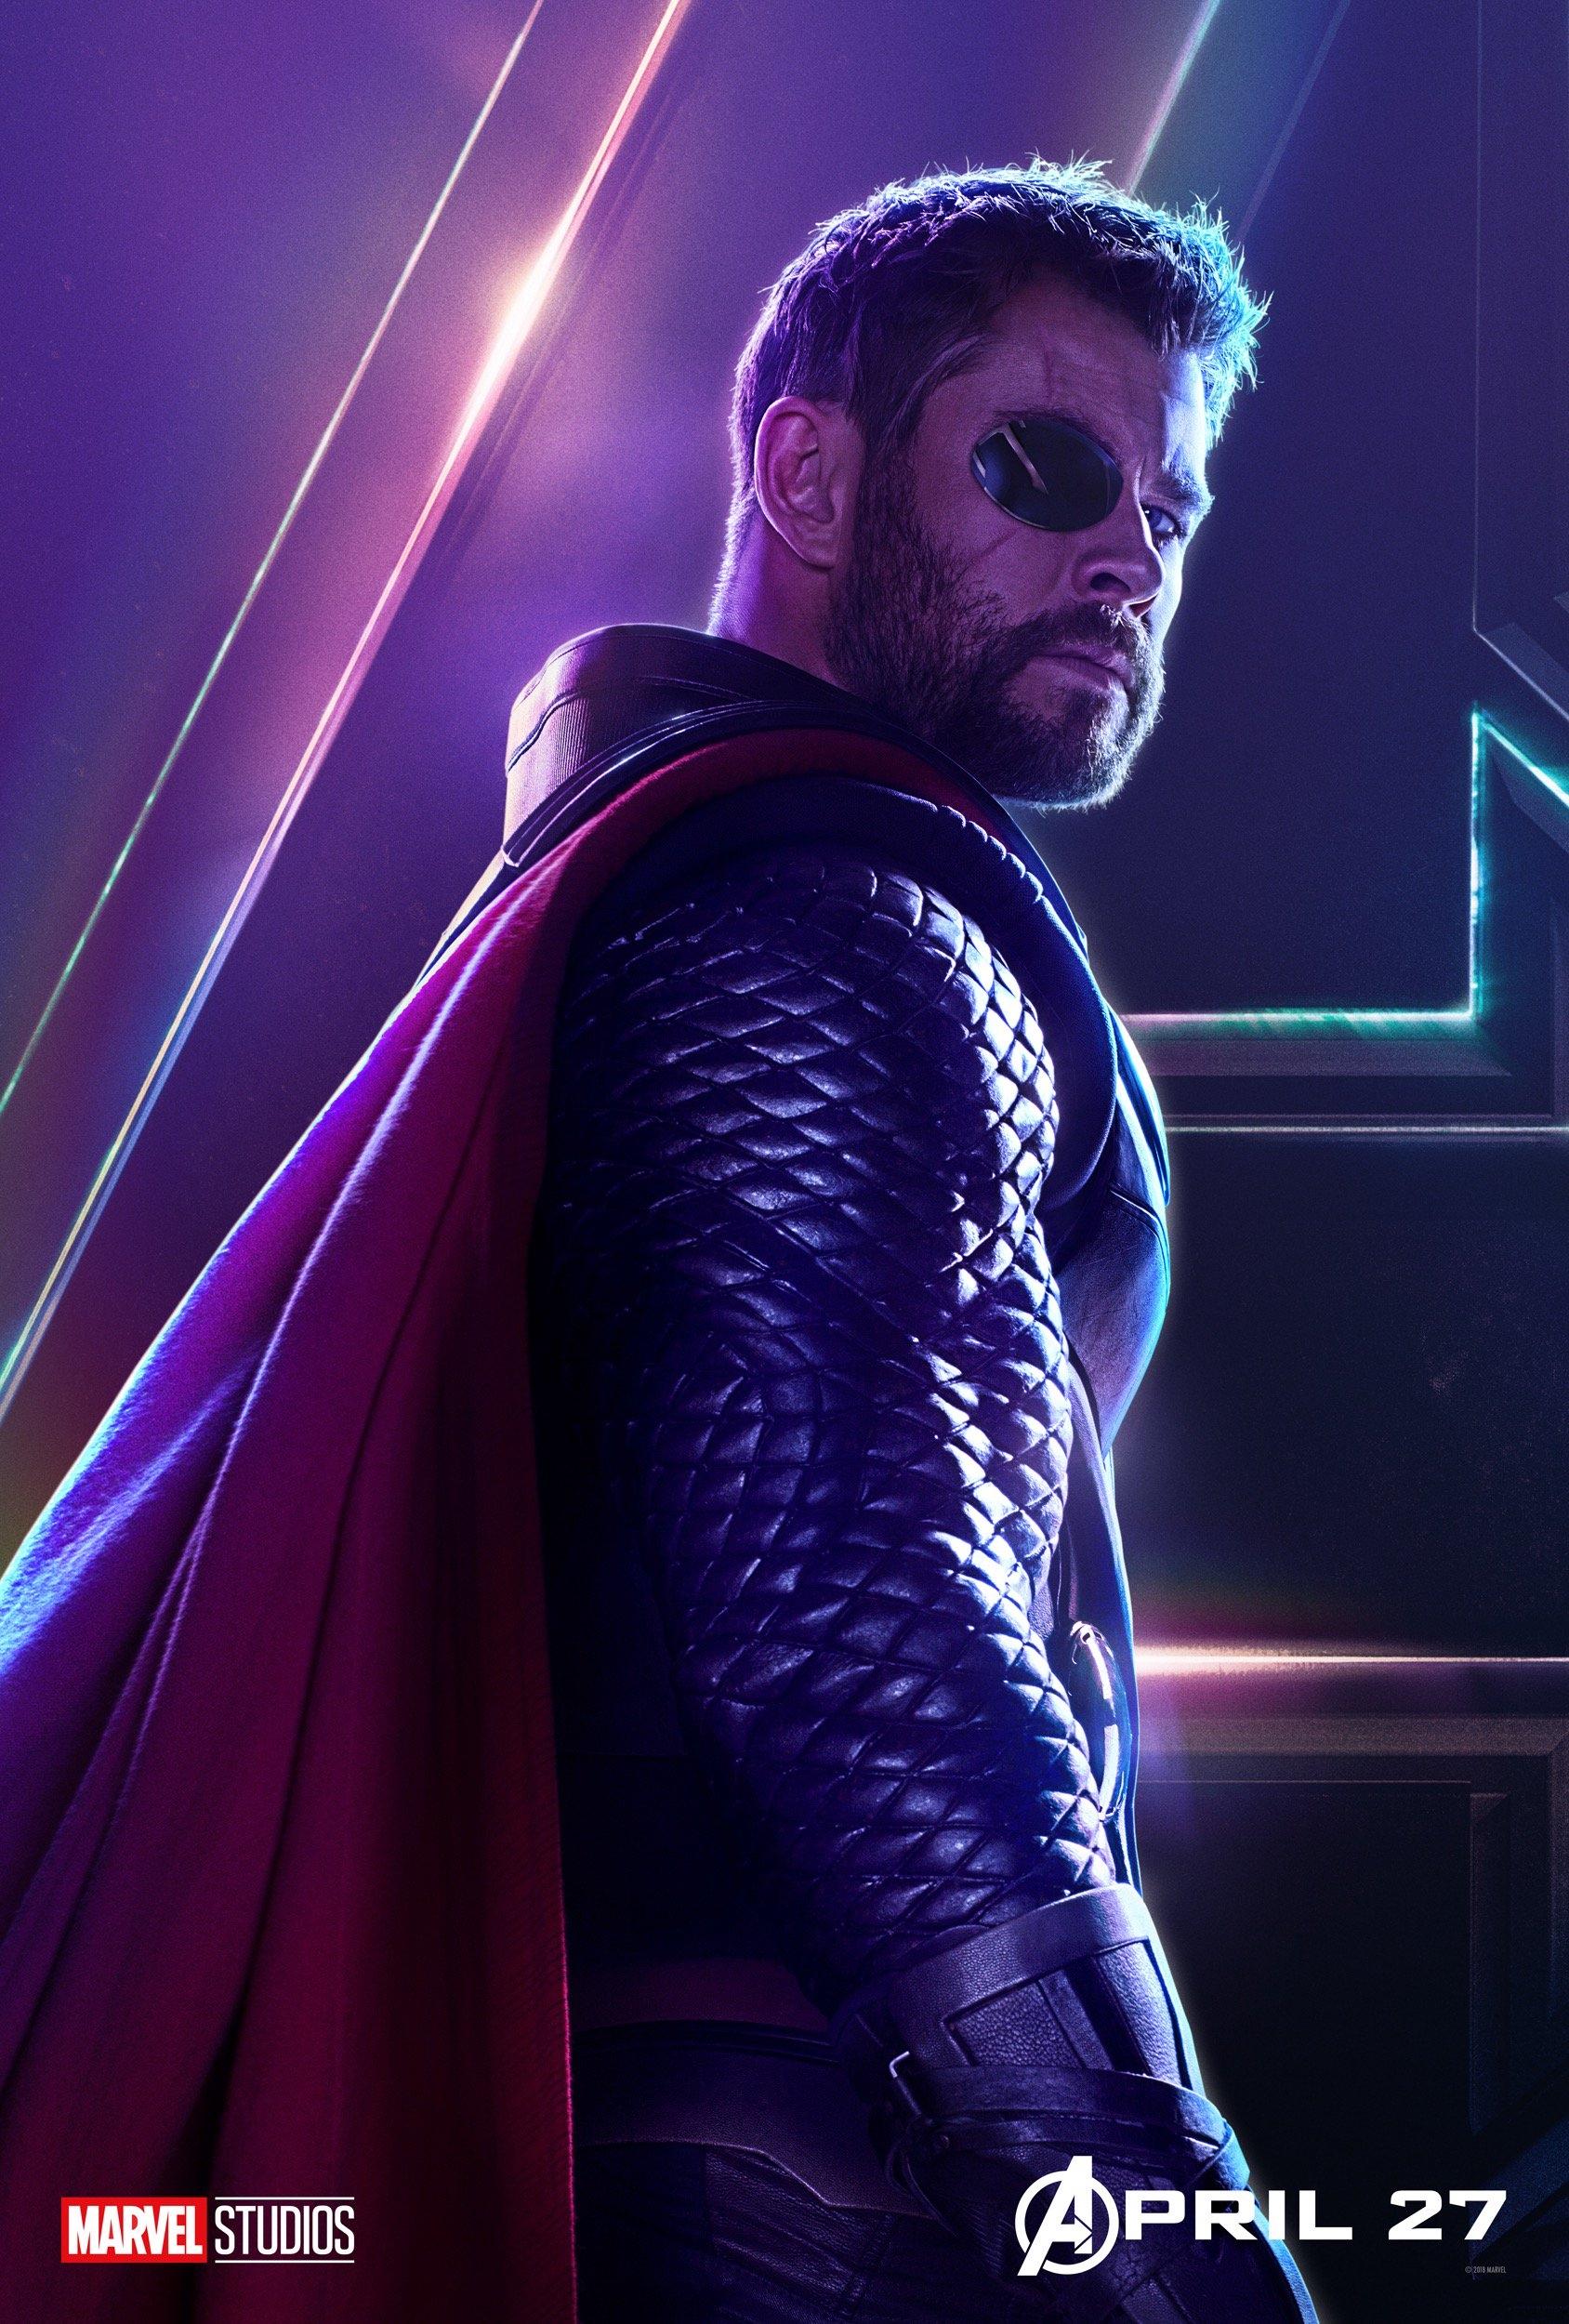 image - avengers infinity war thor poster | marvel cinematic